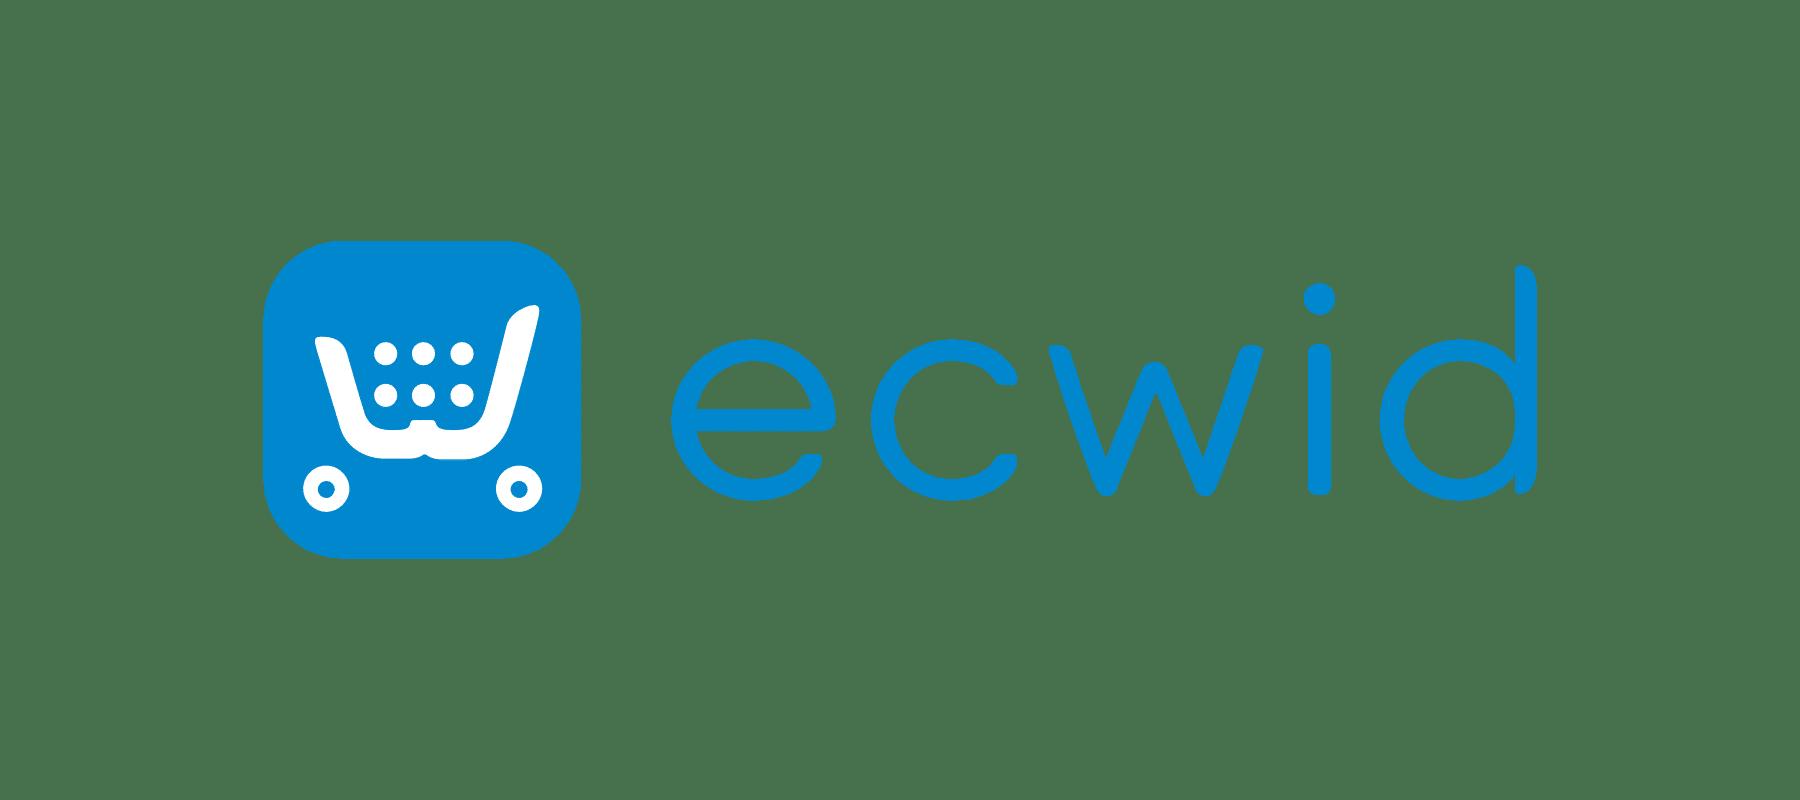 15 WordPress Themes With Ecwid Integration